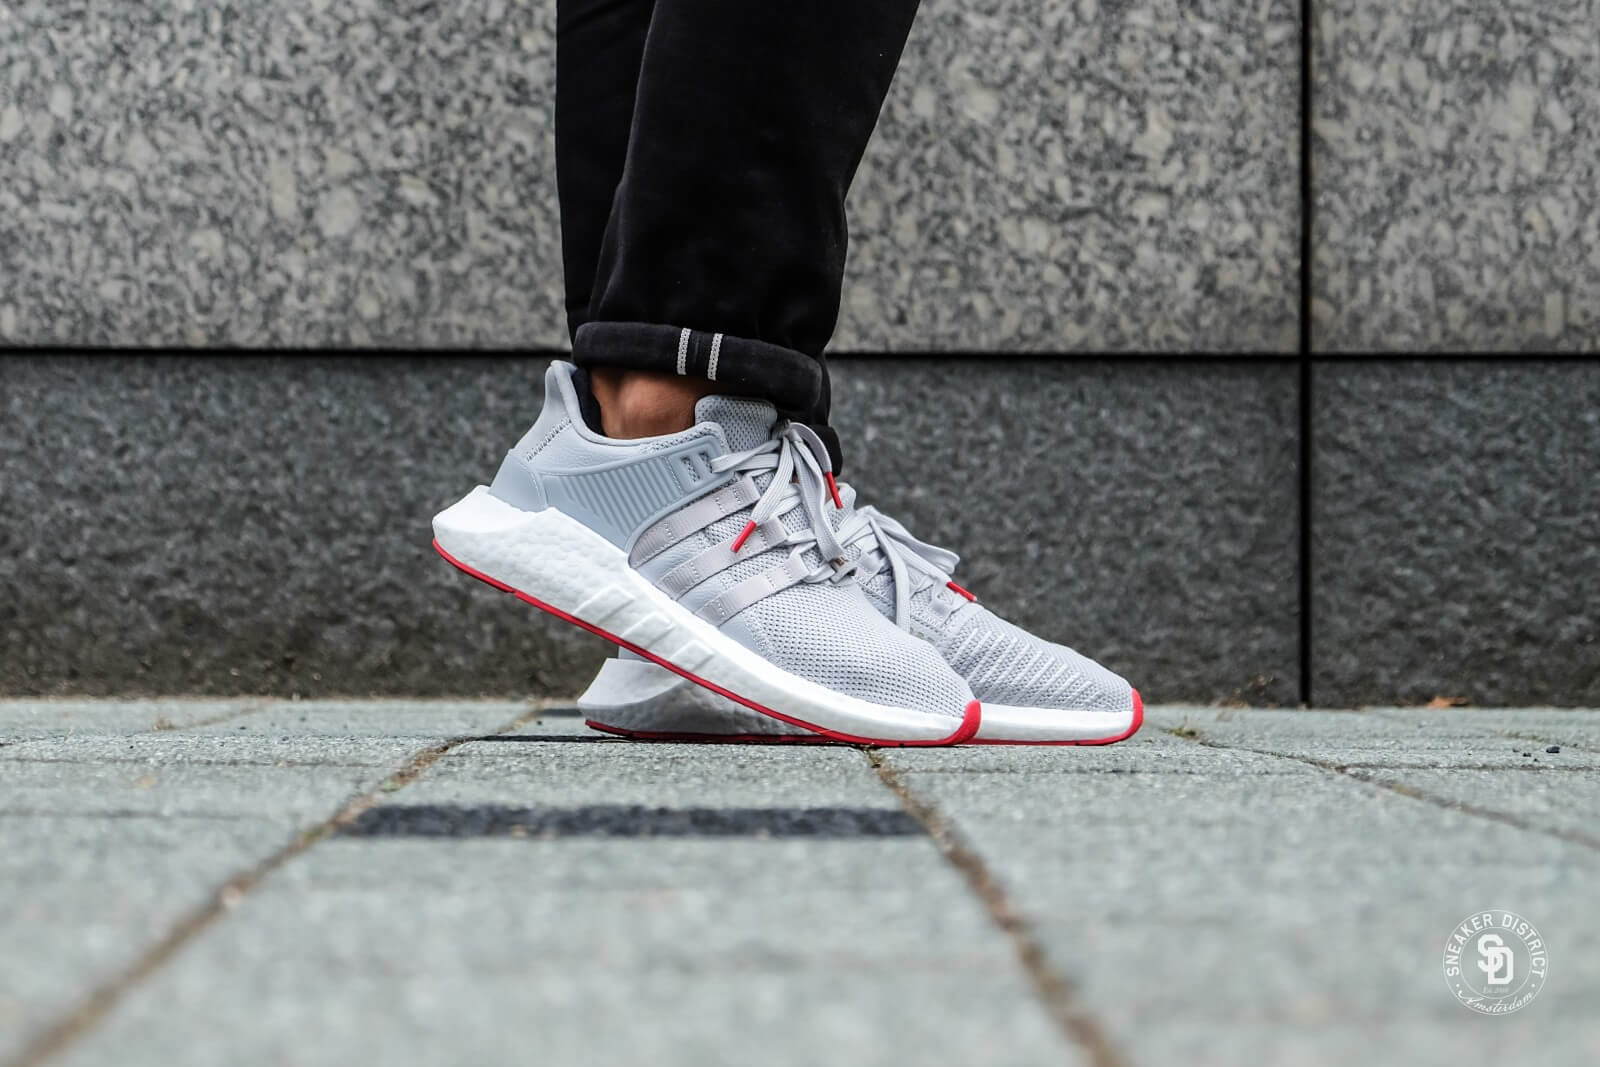 Adidas EQT Support 93/17 Matte Silver